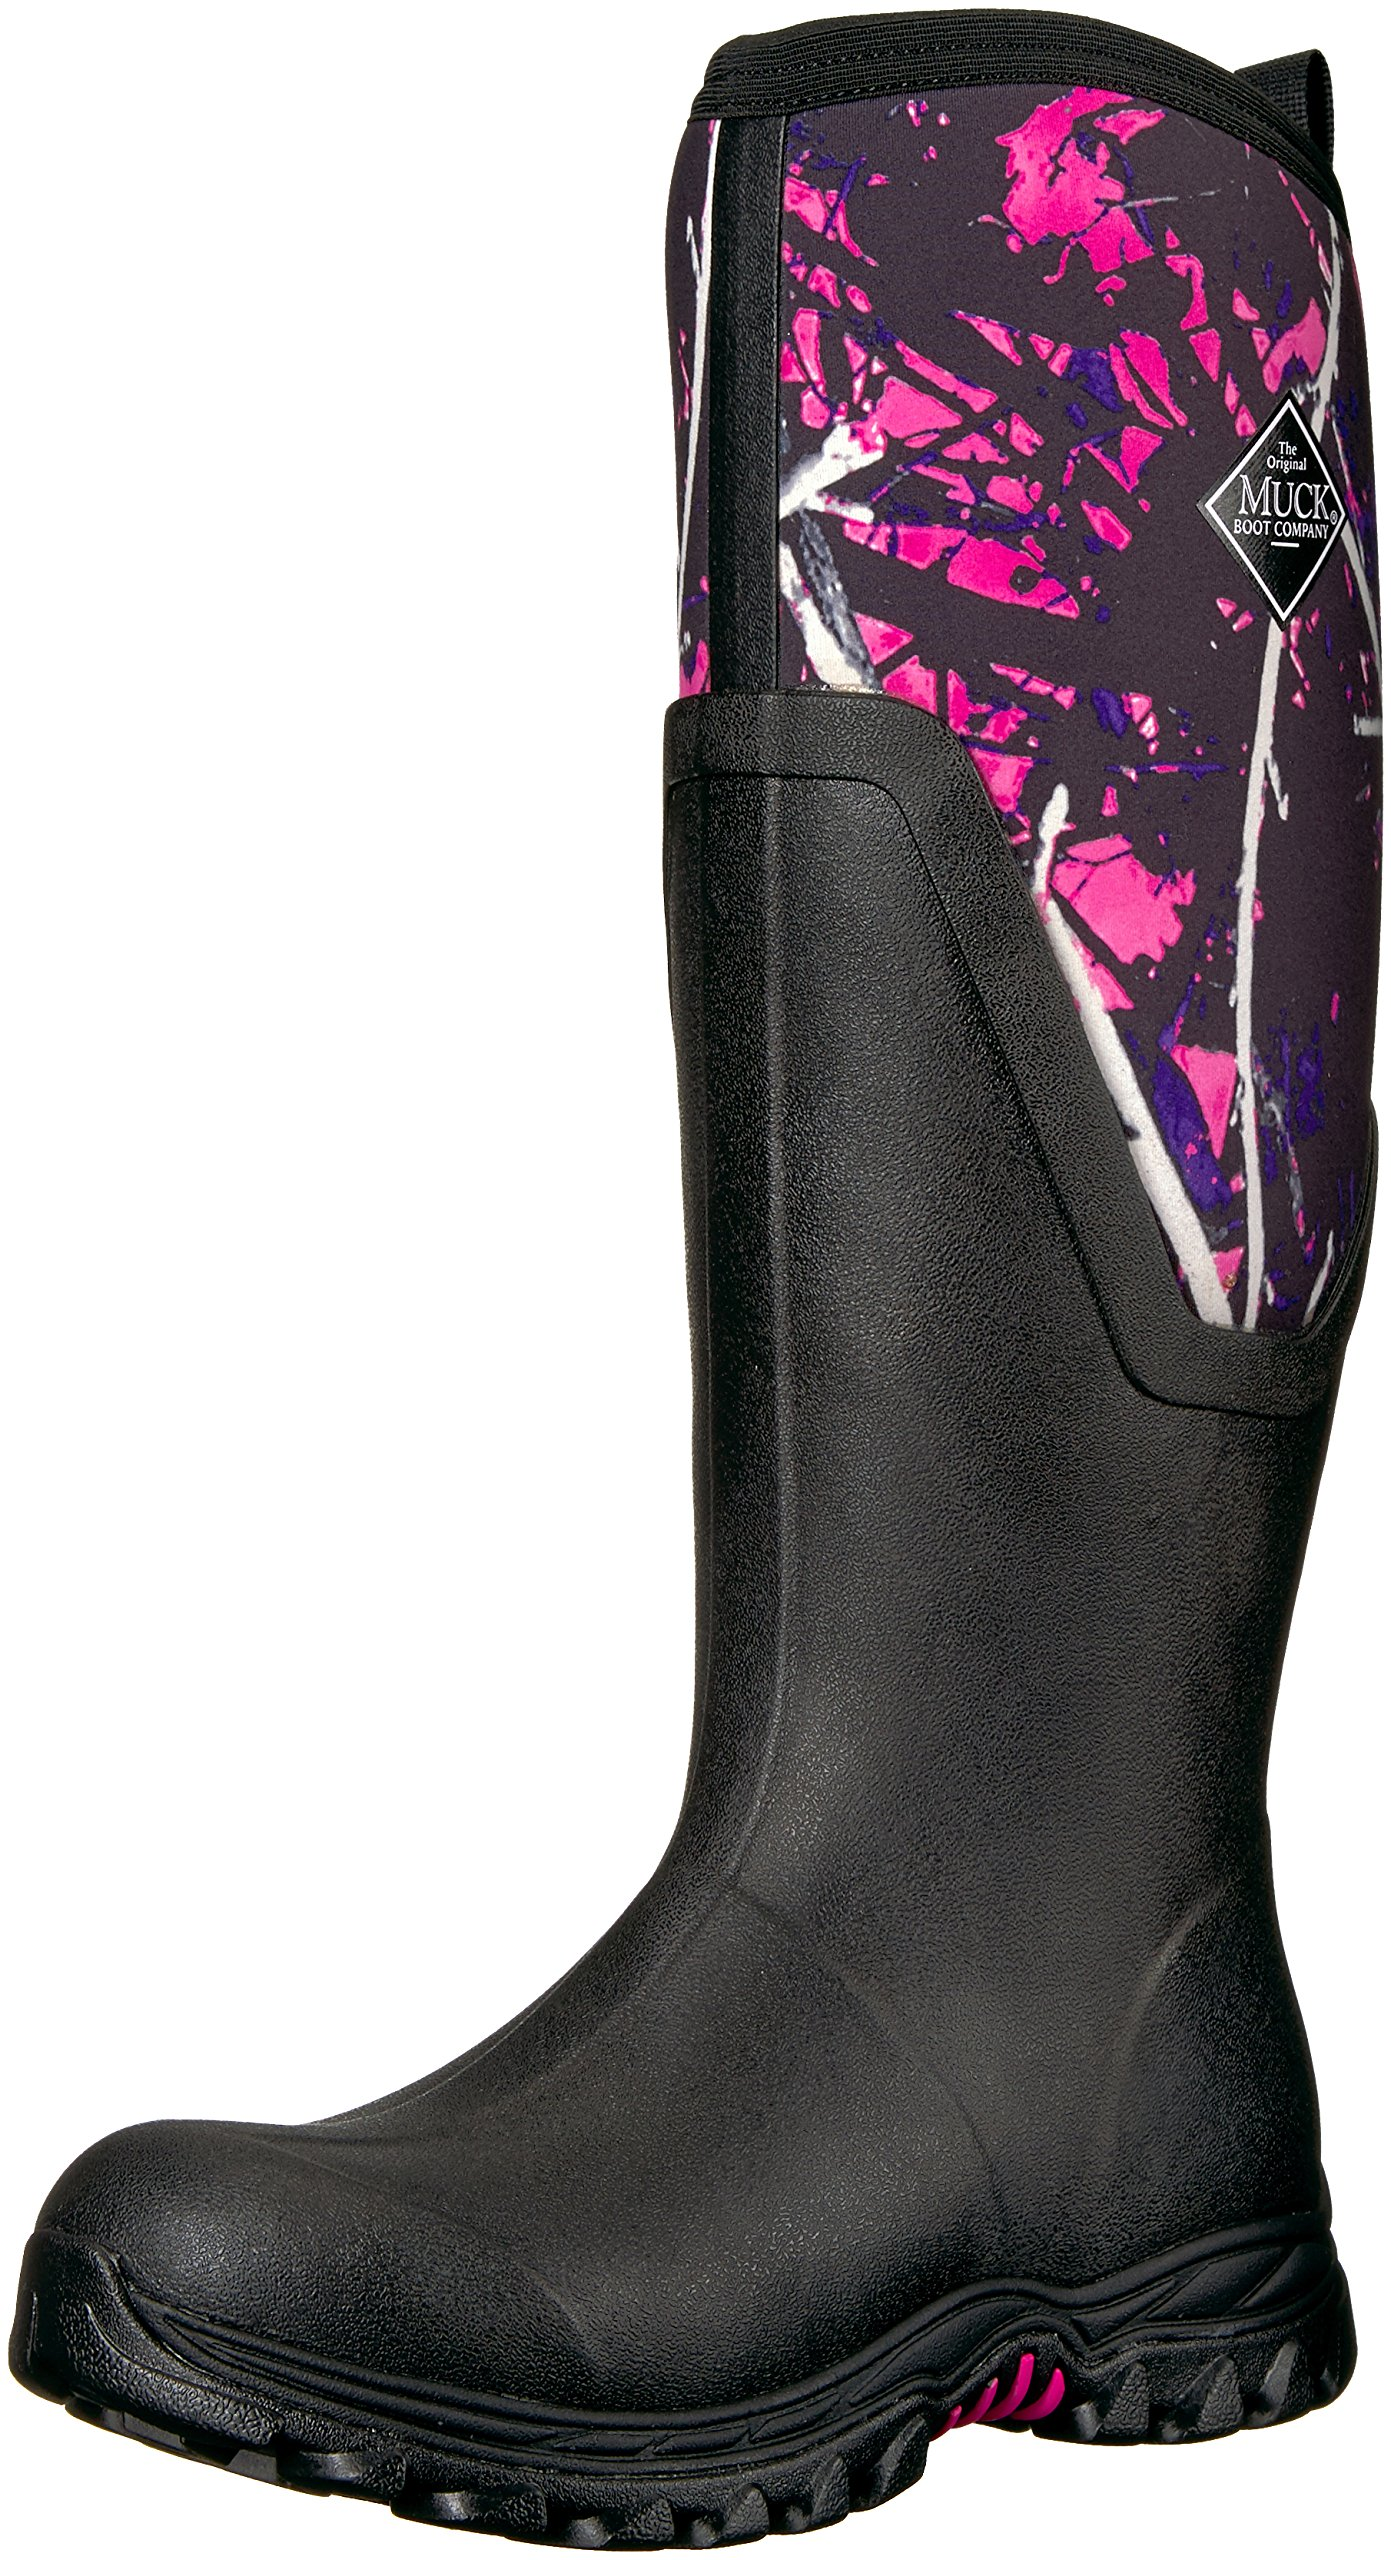 Muck Boot Women's Arctic Sport II Tall Work Boot, Black/Muddy Girl, 8 M US